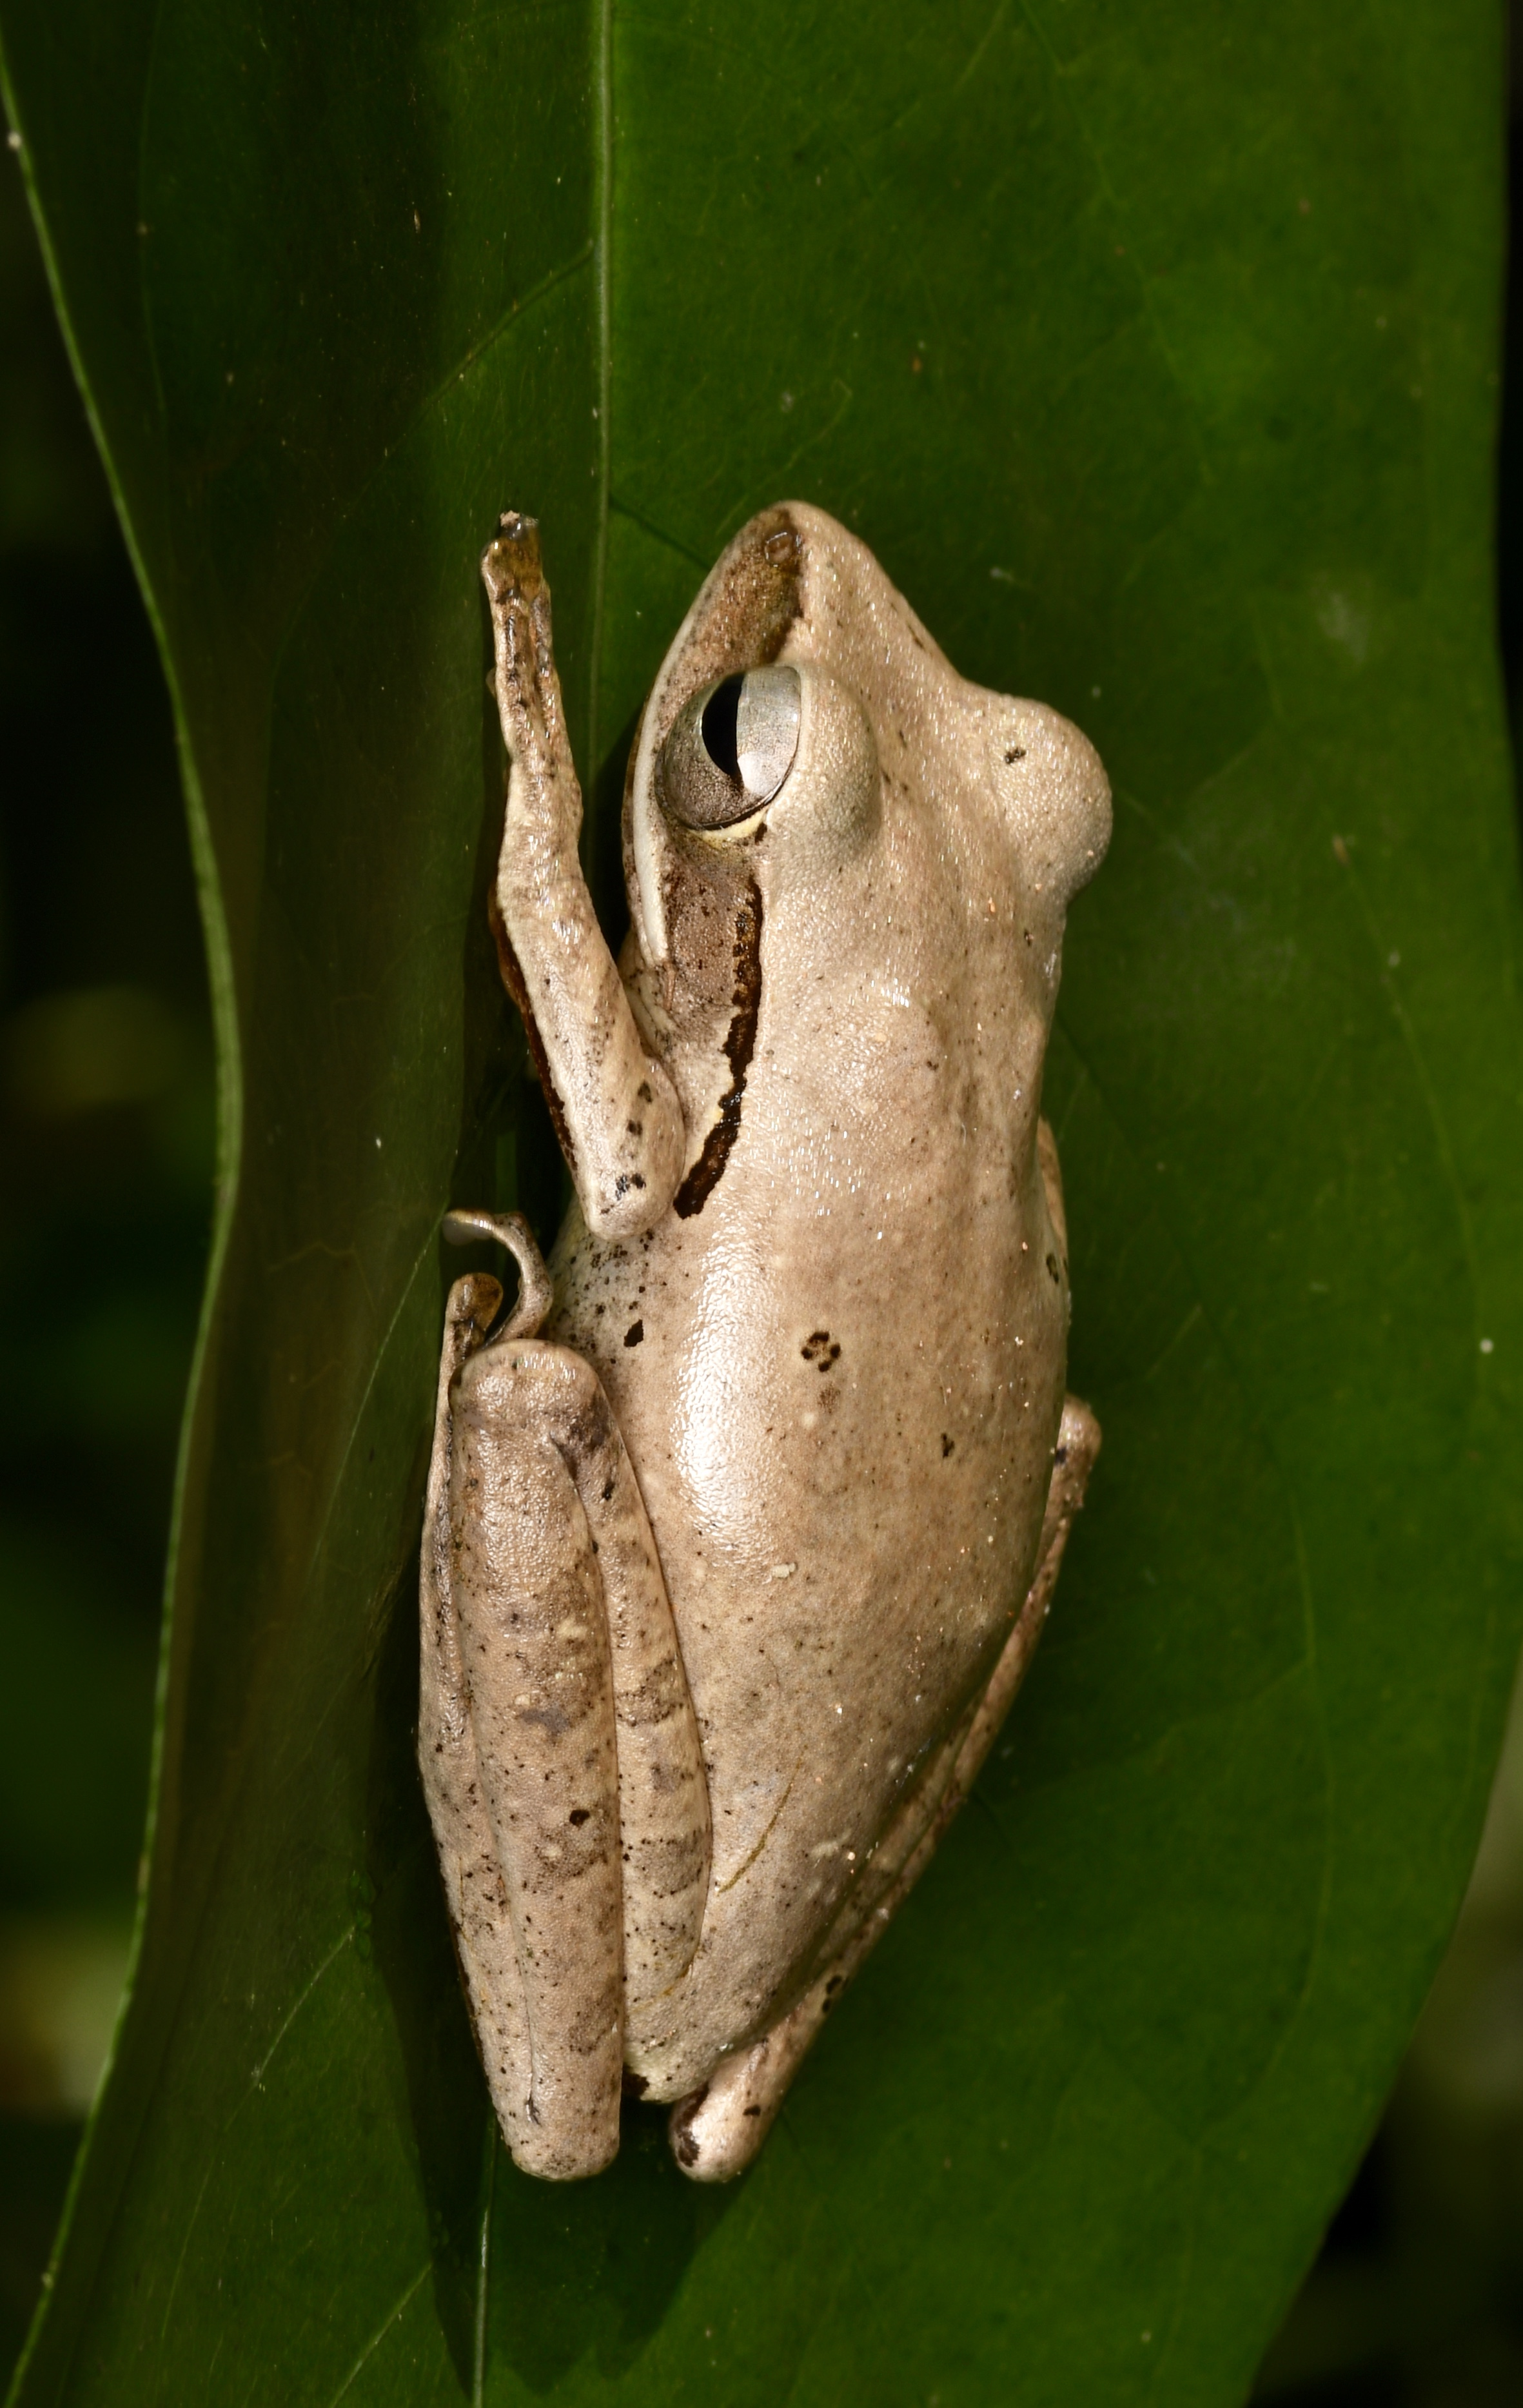 Southeast Asian Treefrog ( Polypedates leucomystax ), Pulau Pinang, Malaysia